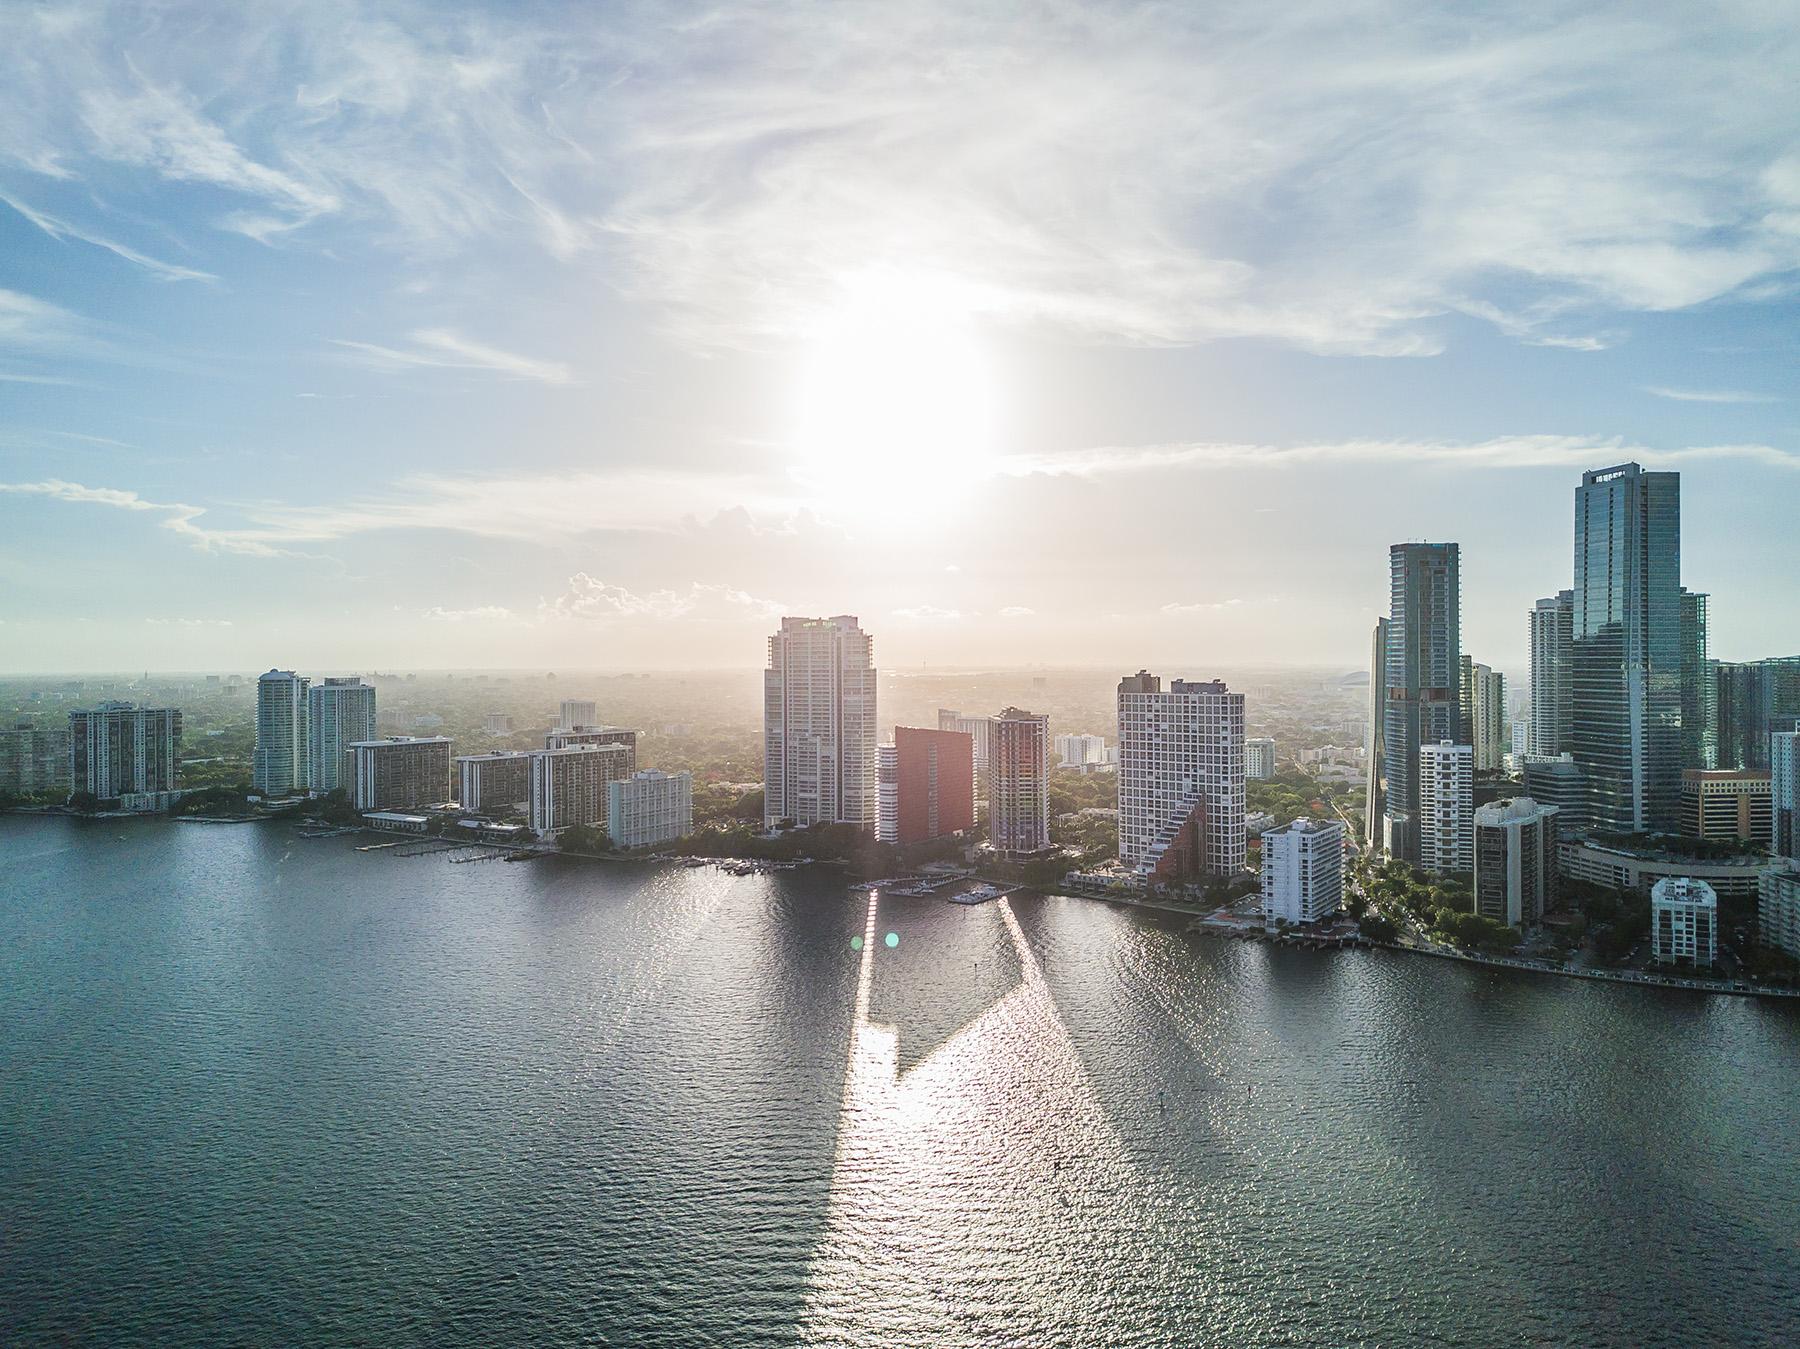 Azeez Bakare Studios - HD Aerial Drone Architectural Photography - Key Biscayne, Miami, FL